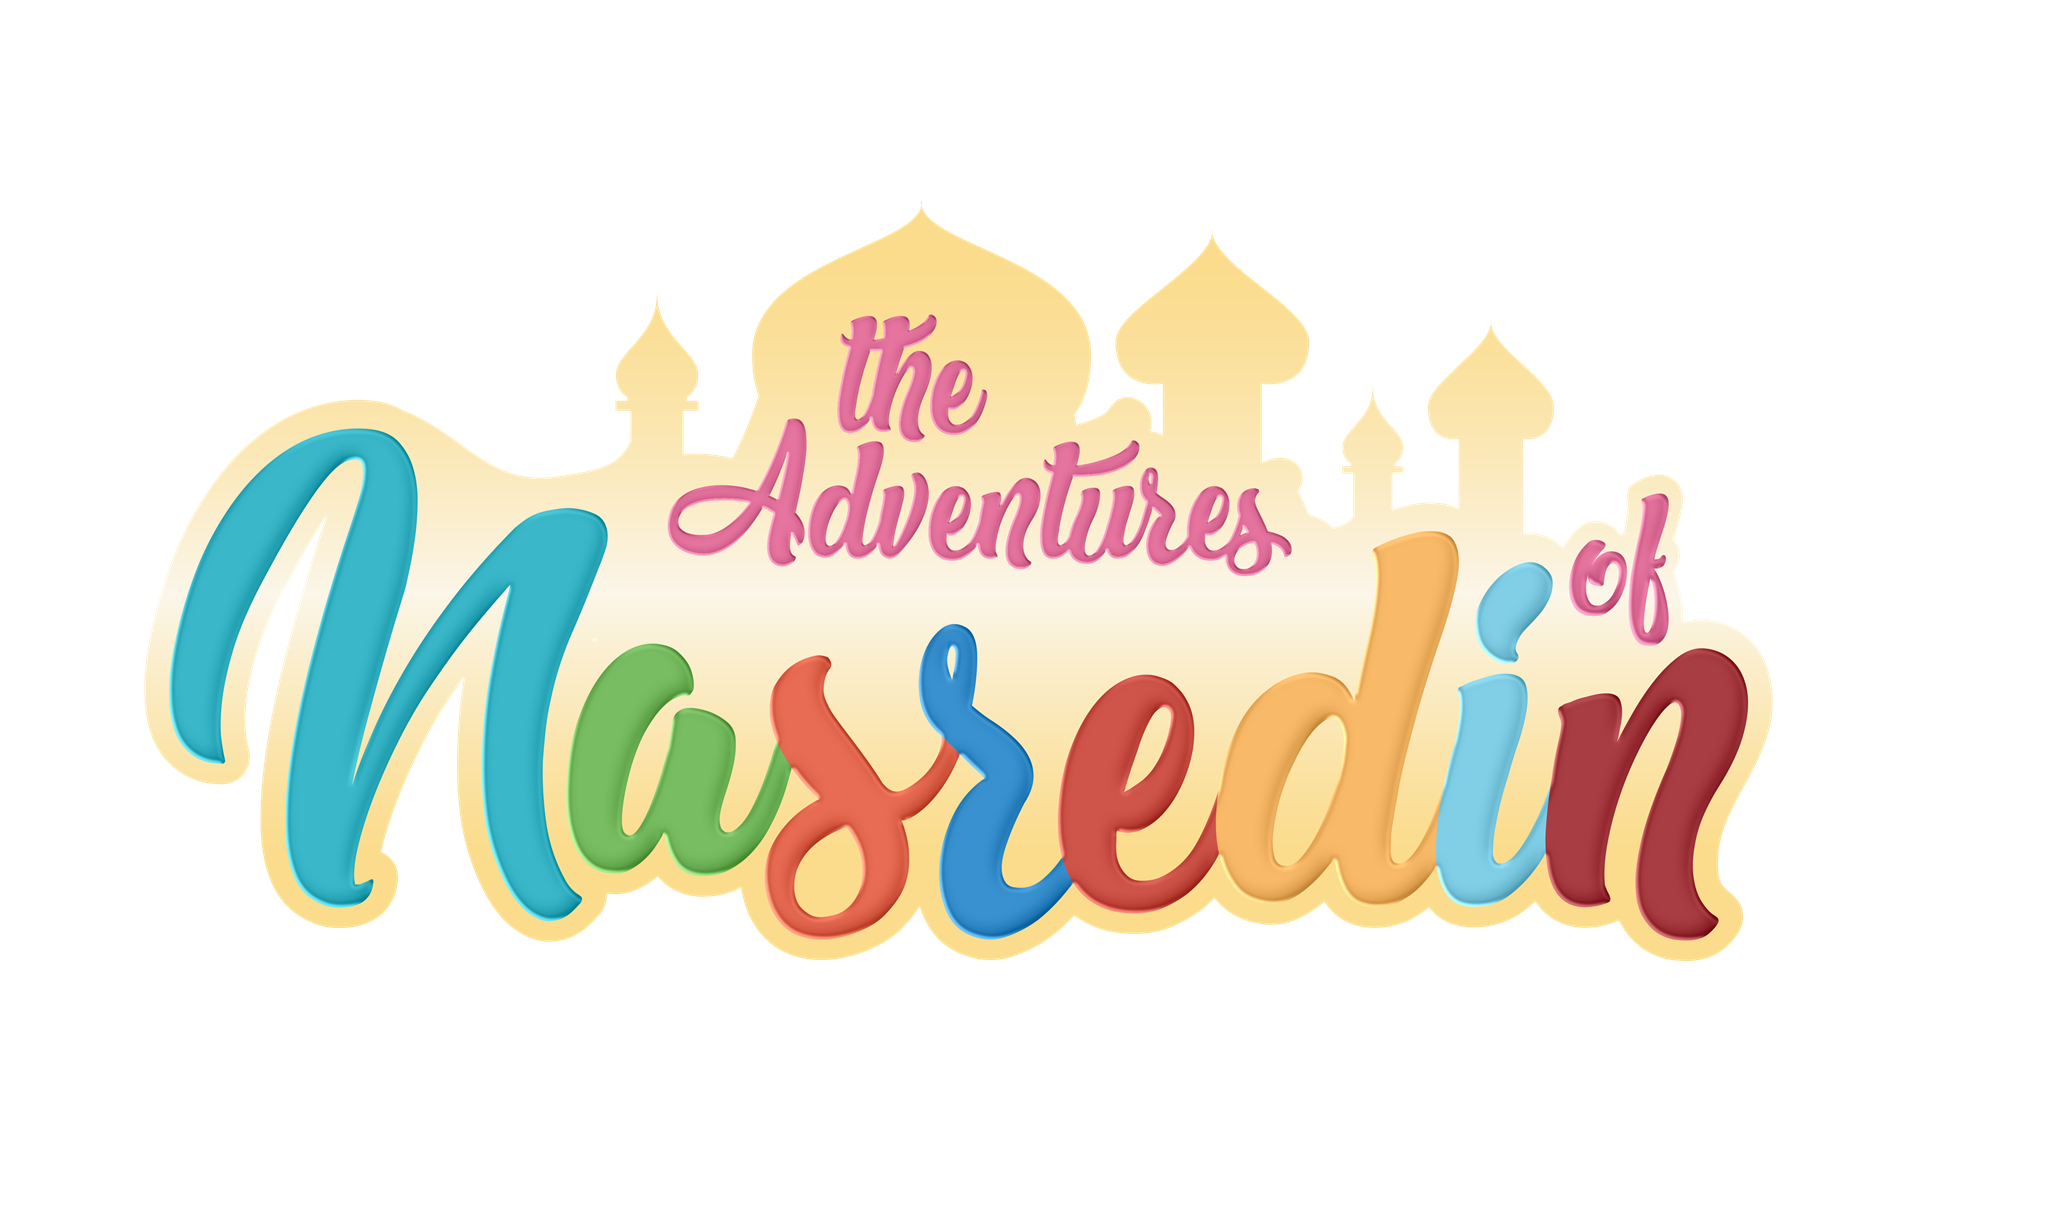 THE ADVENTURES OF NASREDIN